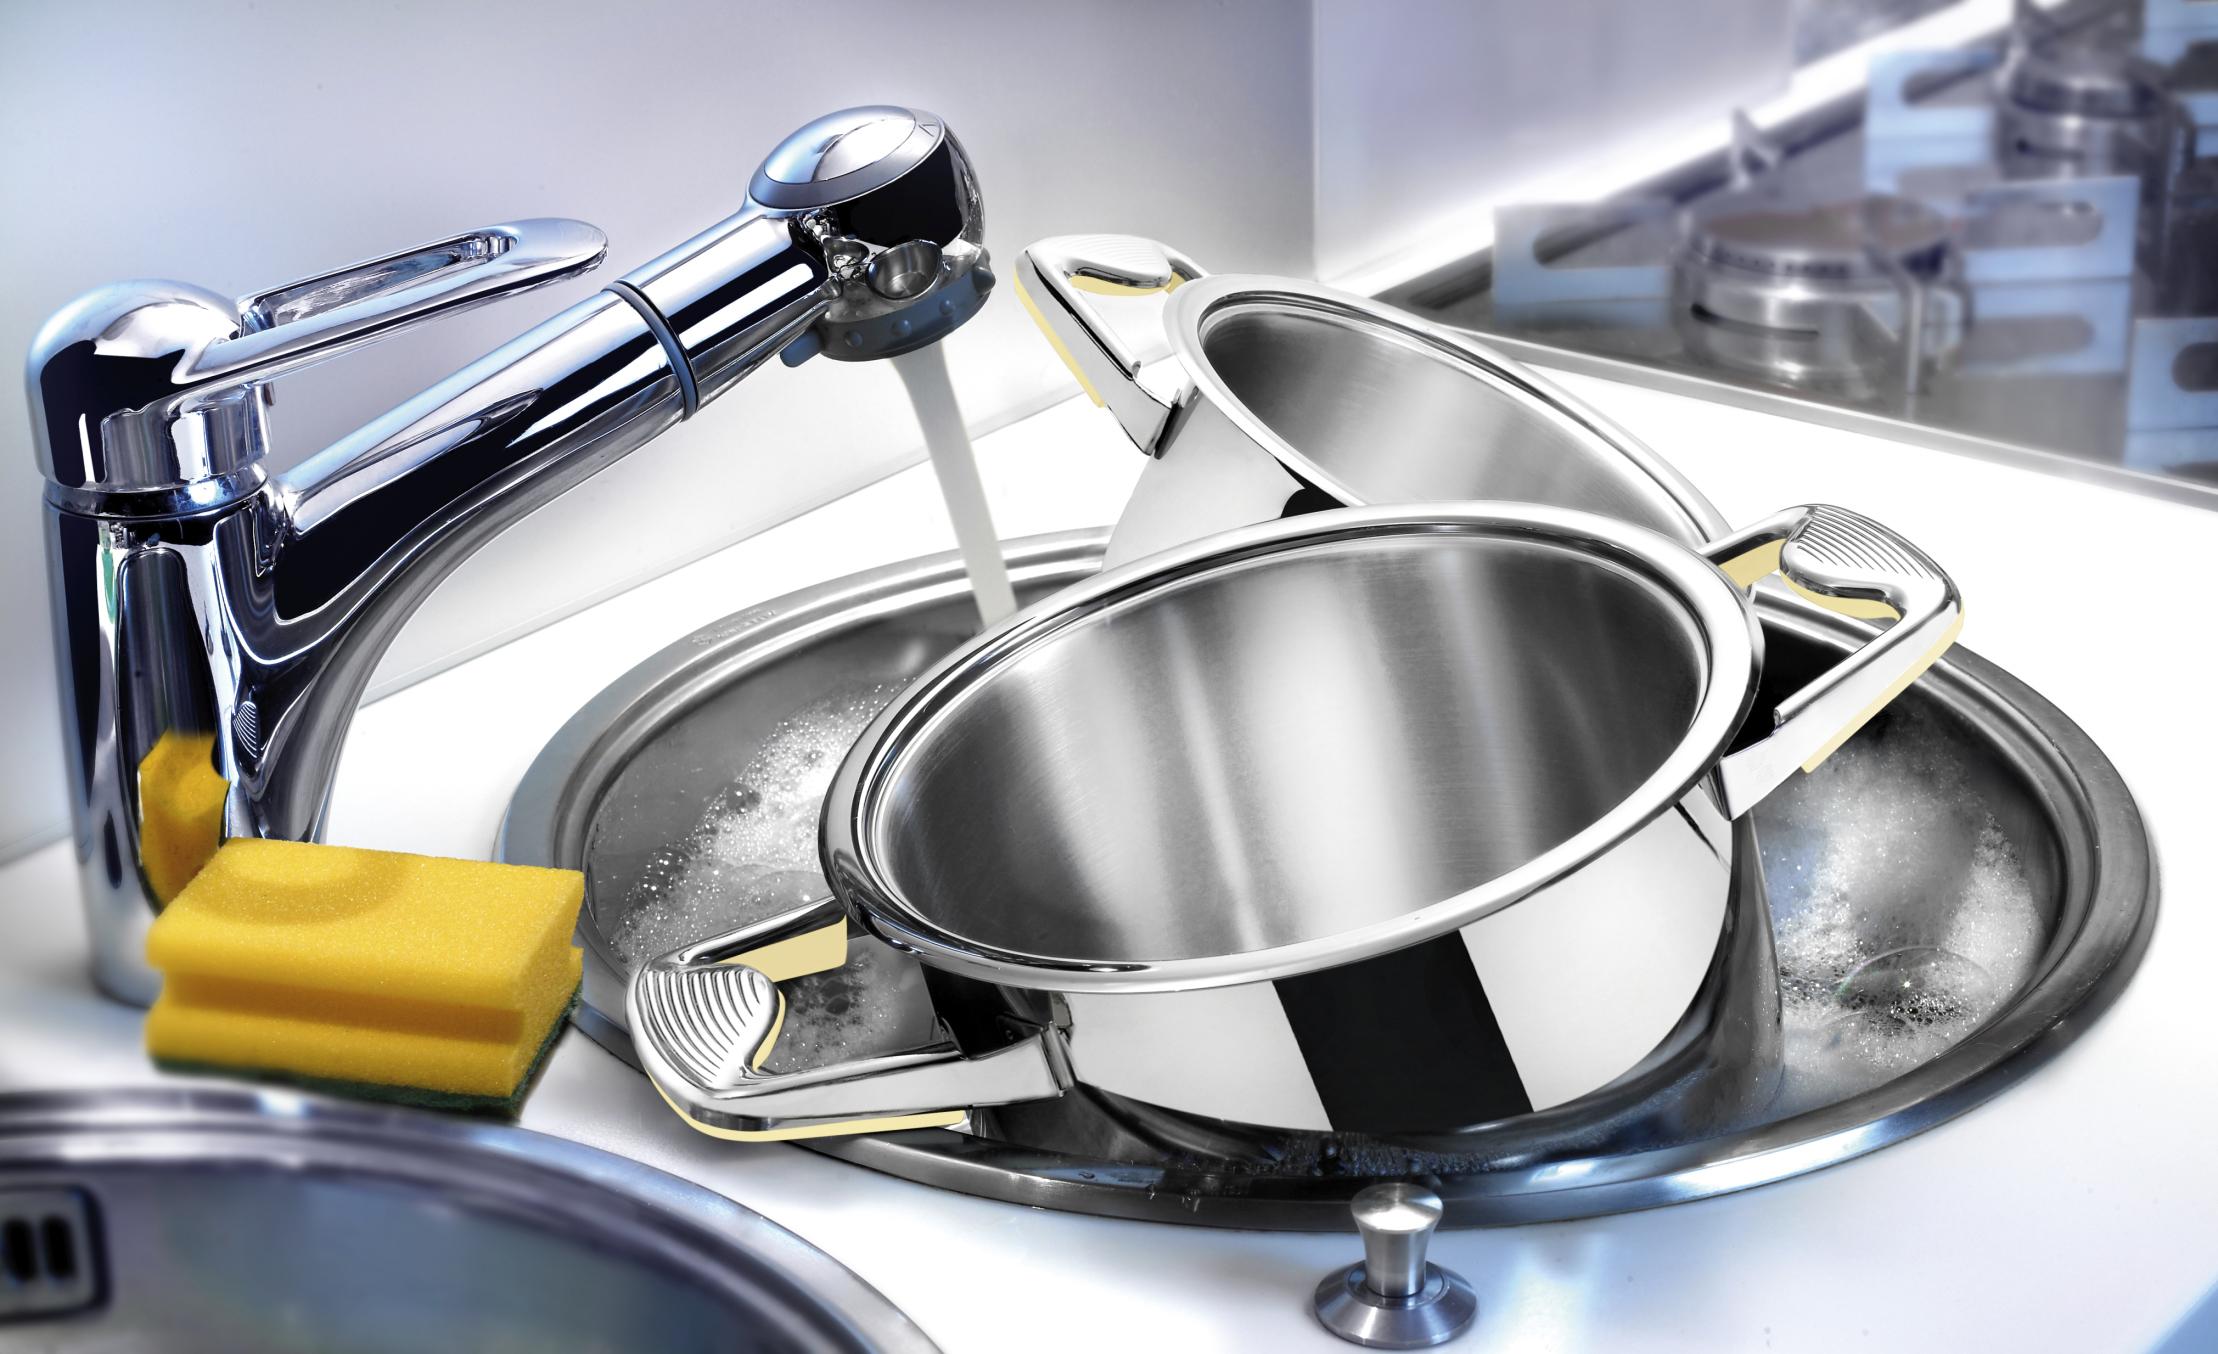 мойка посуды